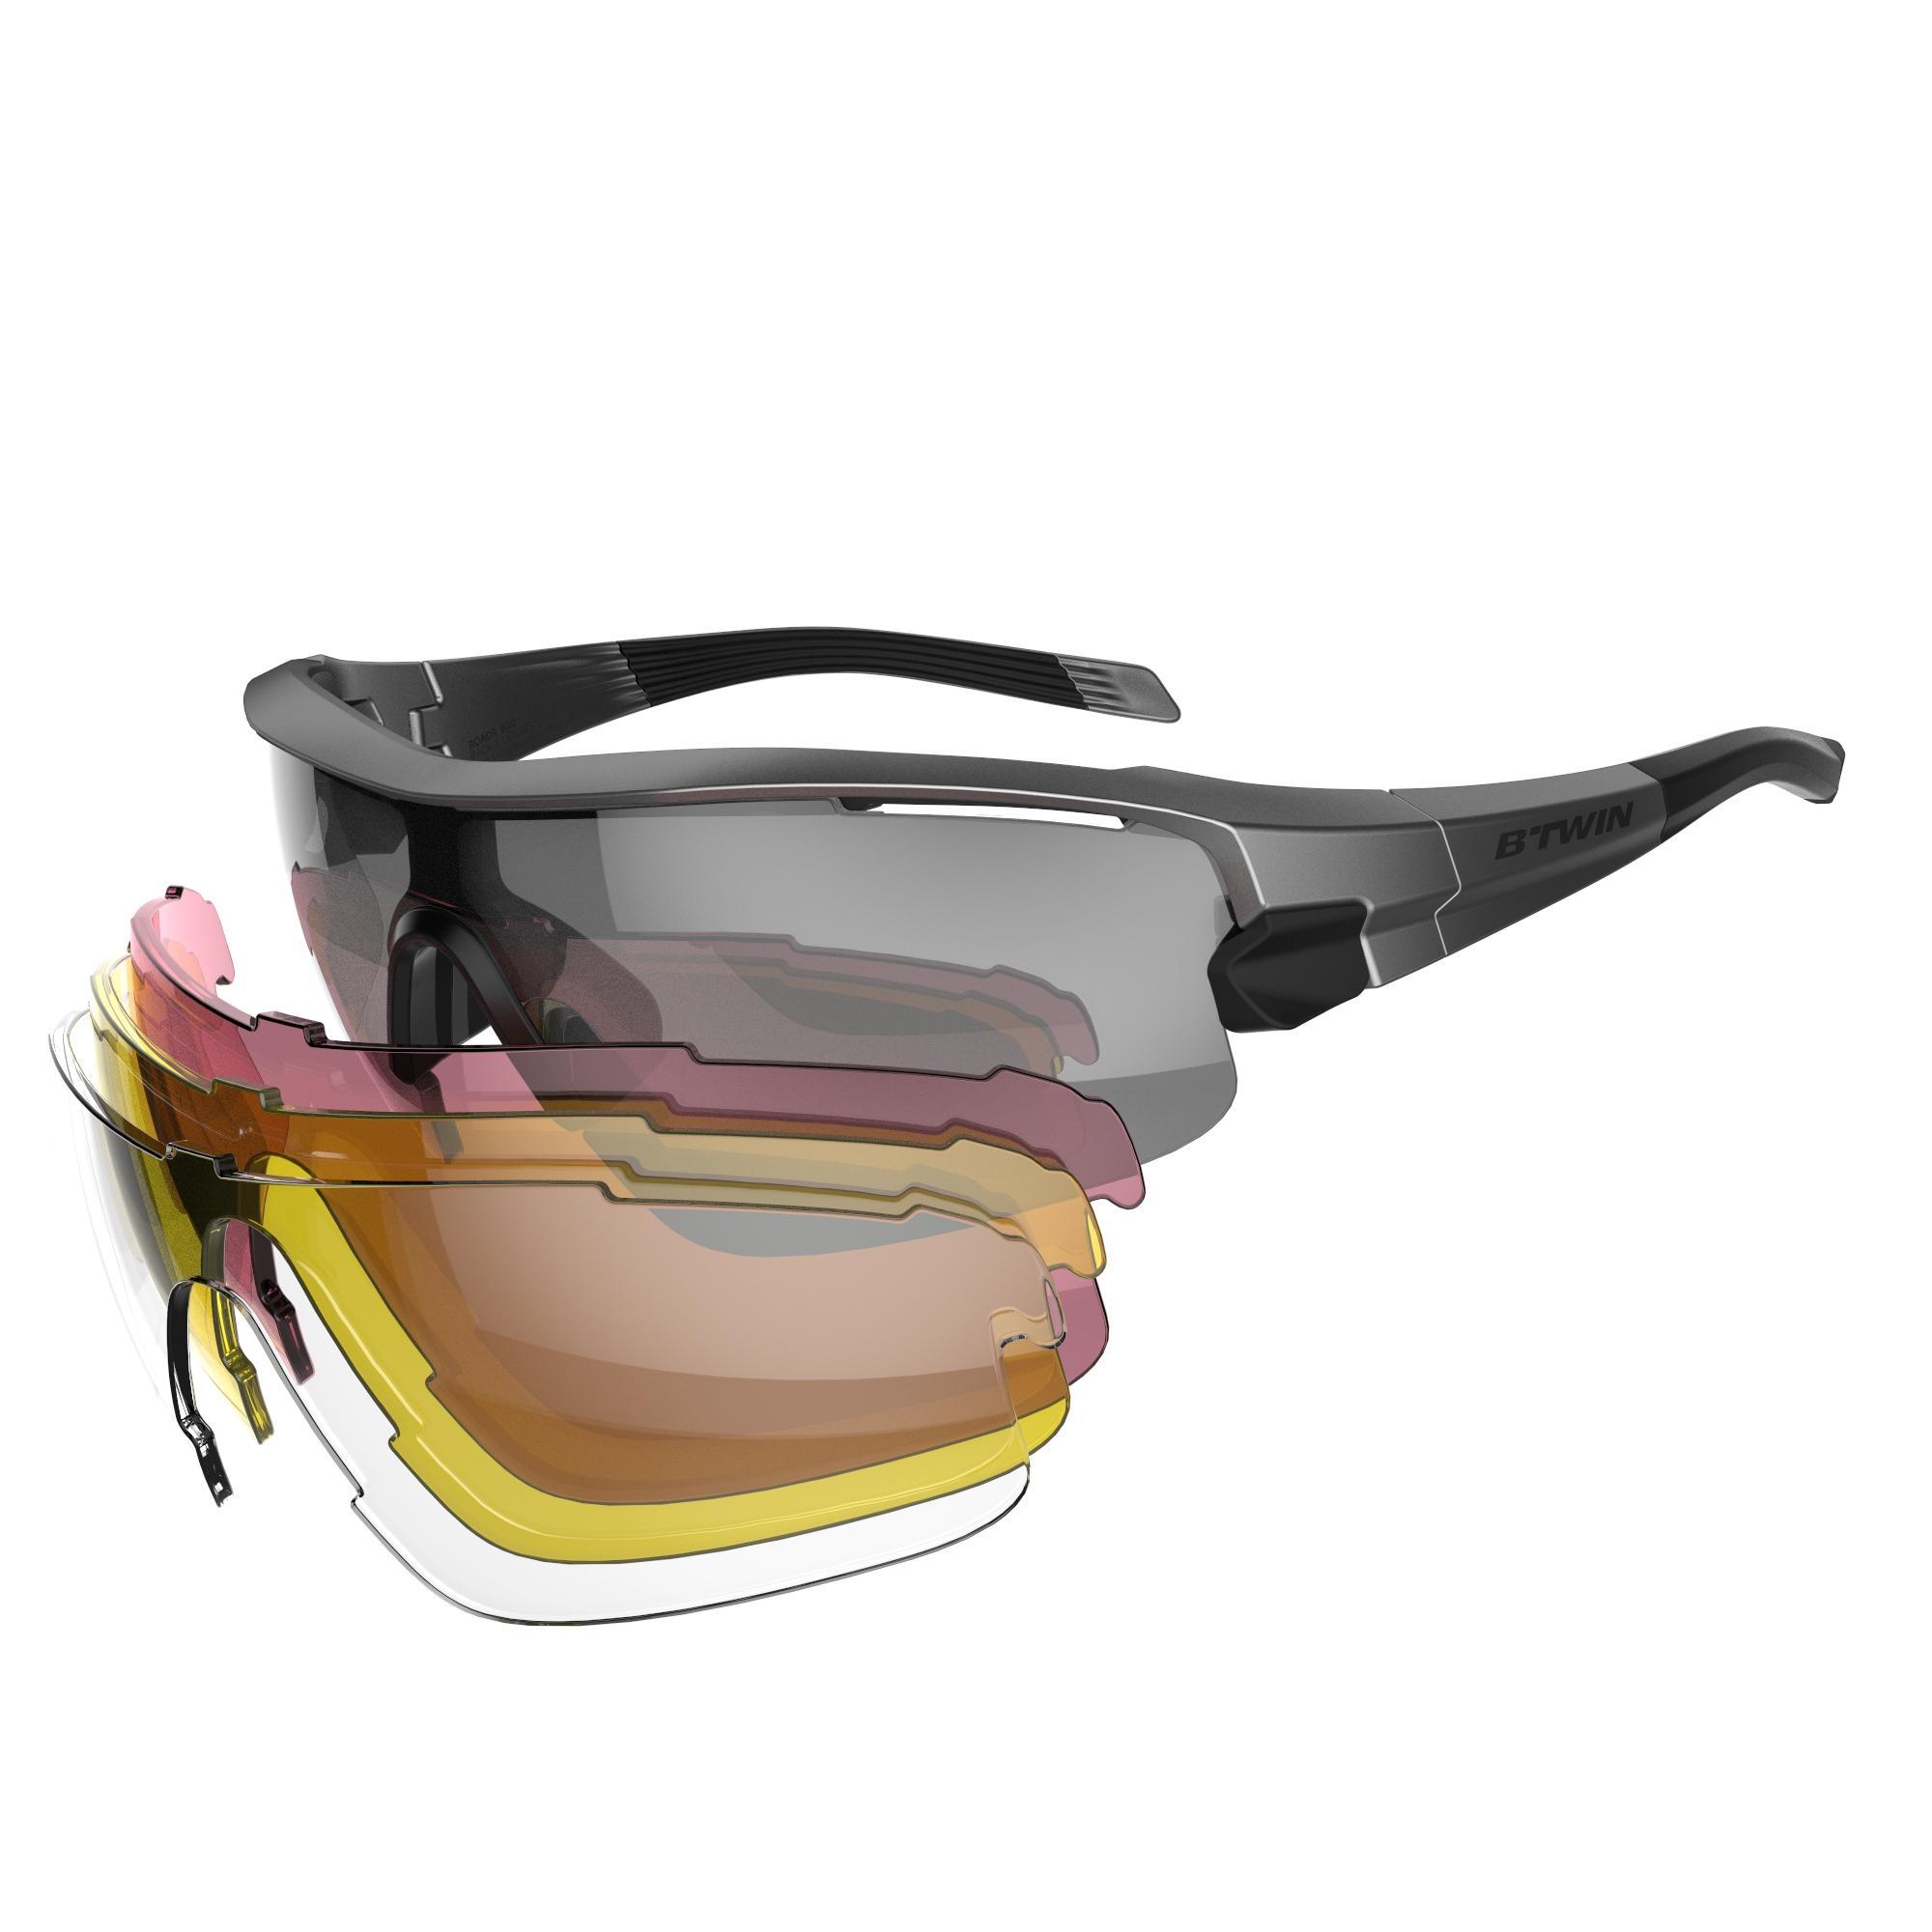 B'twin Fietsbril volwassenen Cycling 900 Grey Pack grijs - 4 verwisselbare glazen